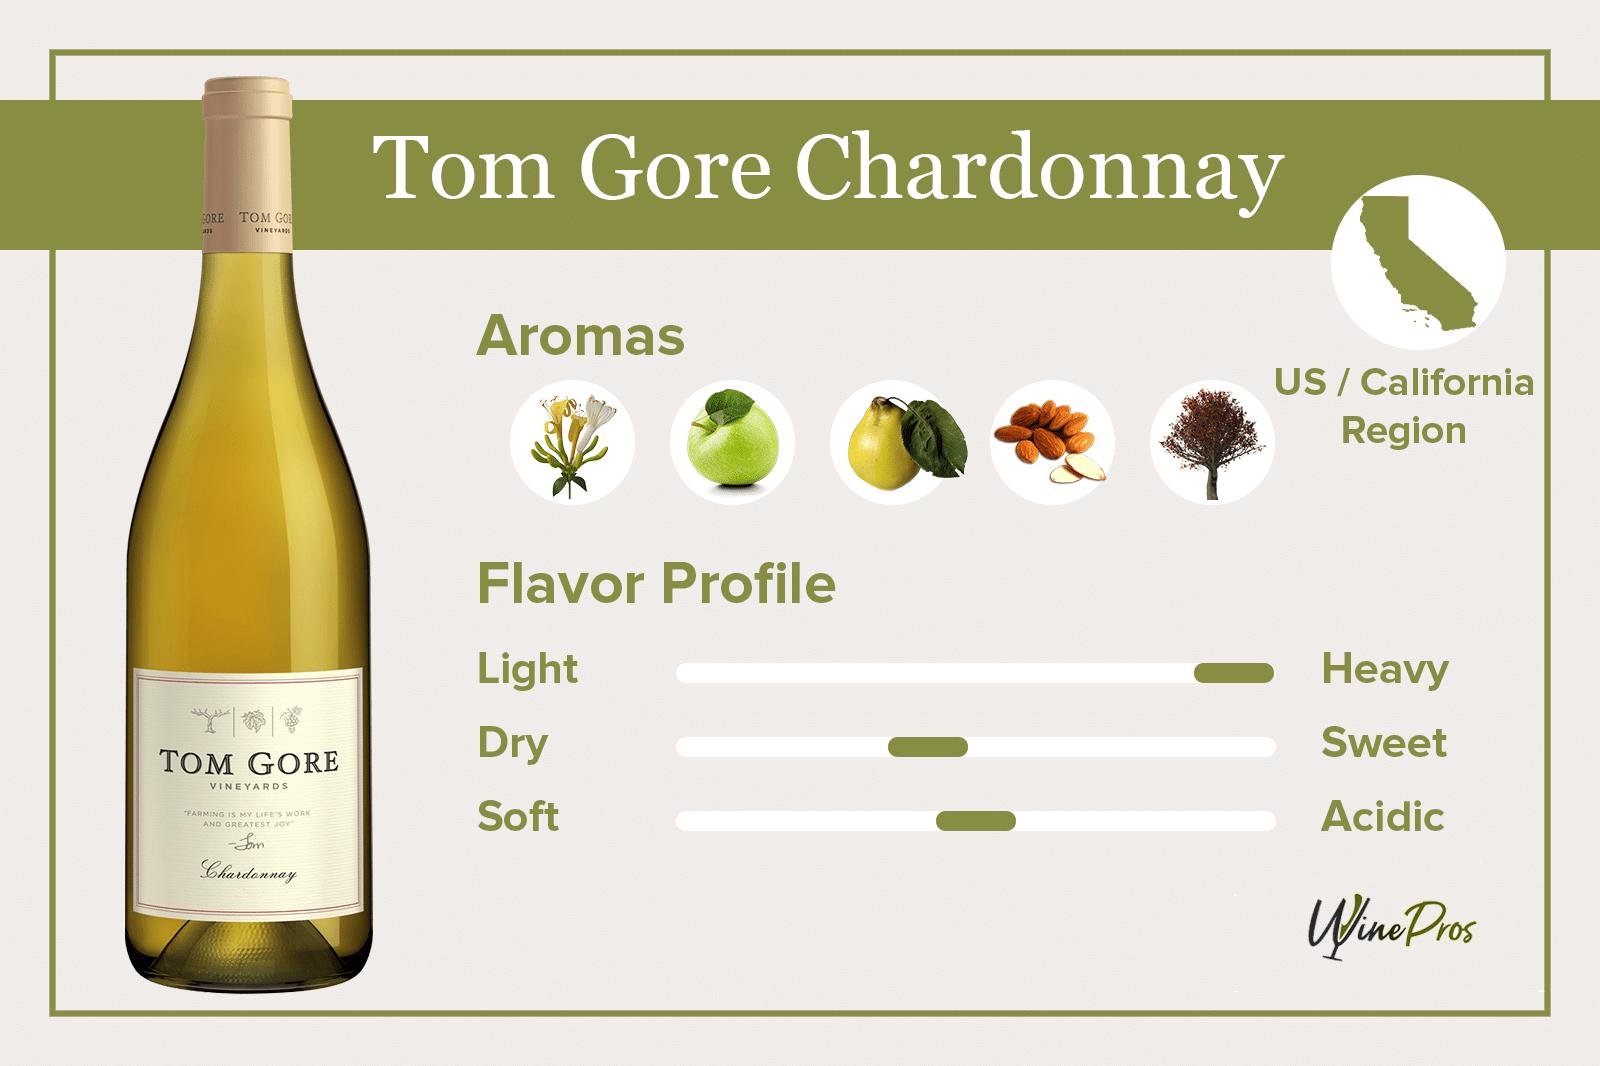 Tom Gore Chardonnay Review (2021)